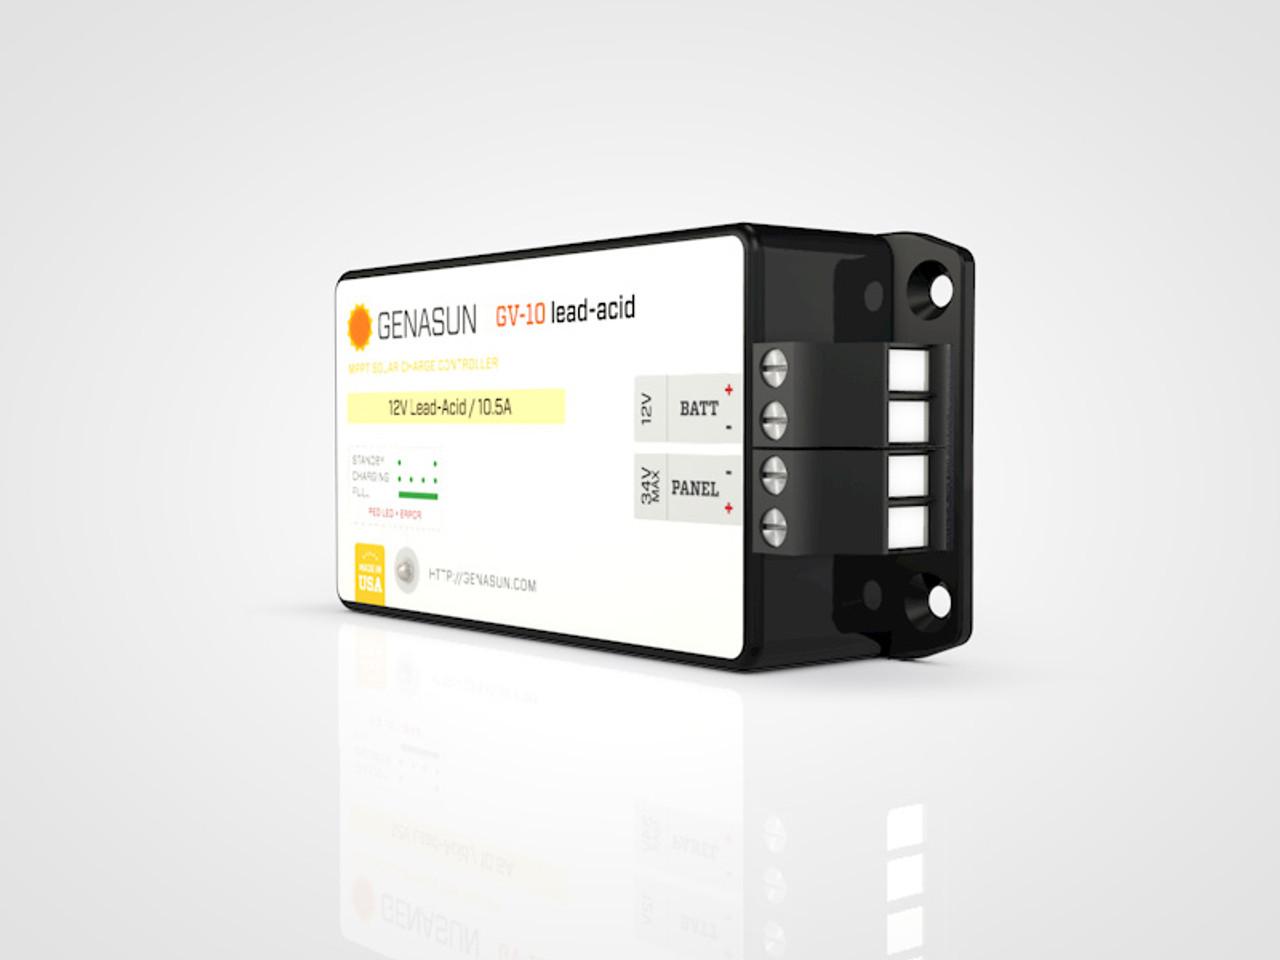 GV-10 | 140W 10.5A Genasun MPPT Solar Charge Controller - Pb - Right2